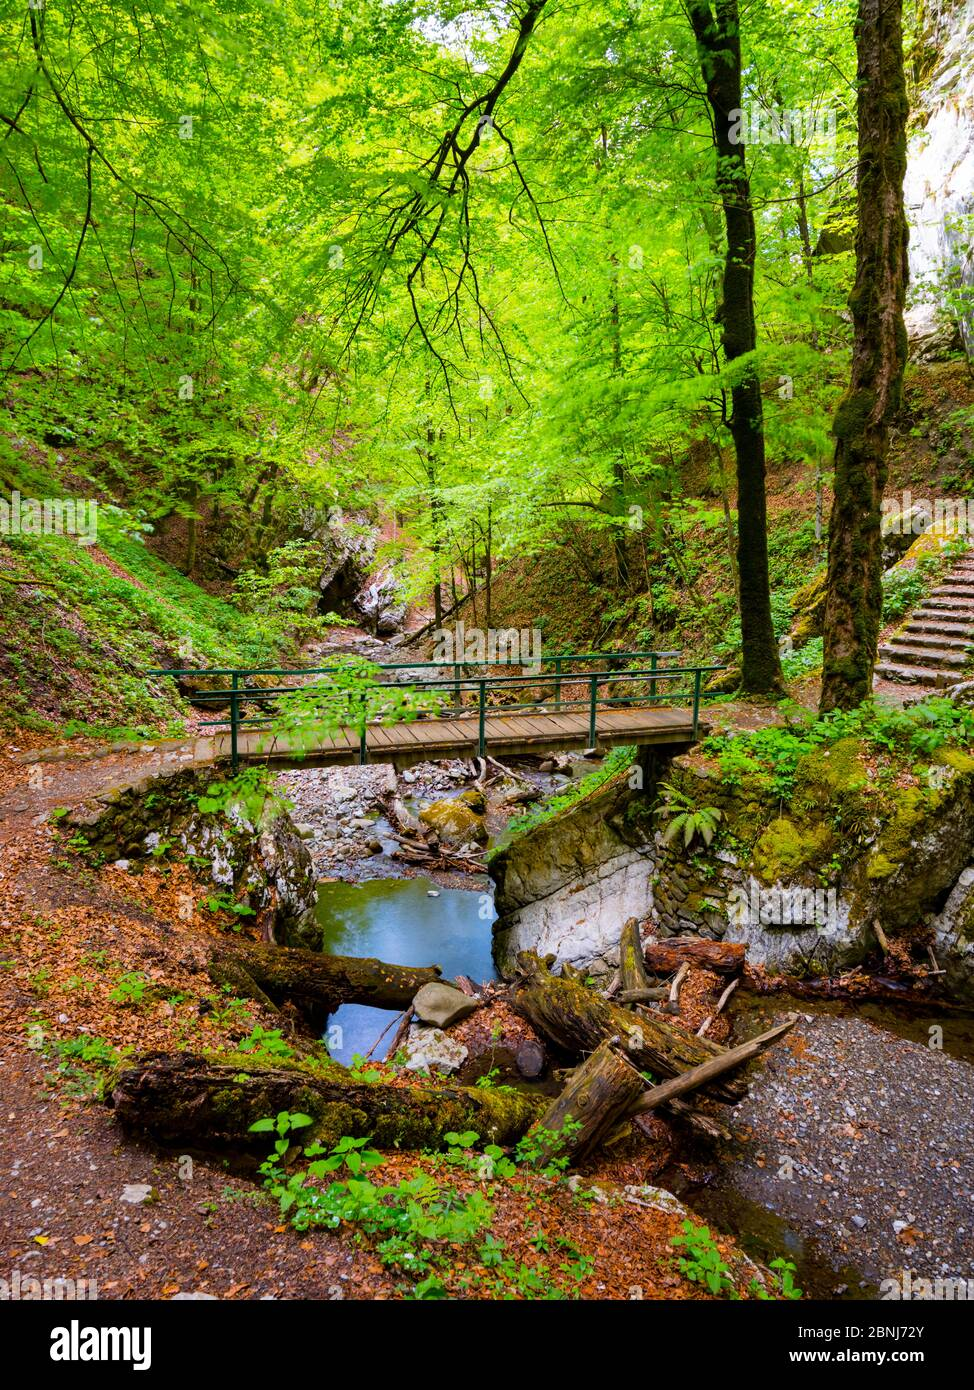 Zeleni vir near Skrad in Croatia Europe Green forest nature natural beauty footpath footbridge wooden bridge stunning Spring Green nature color Stock Photo